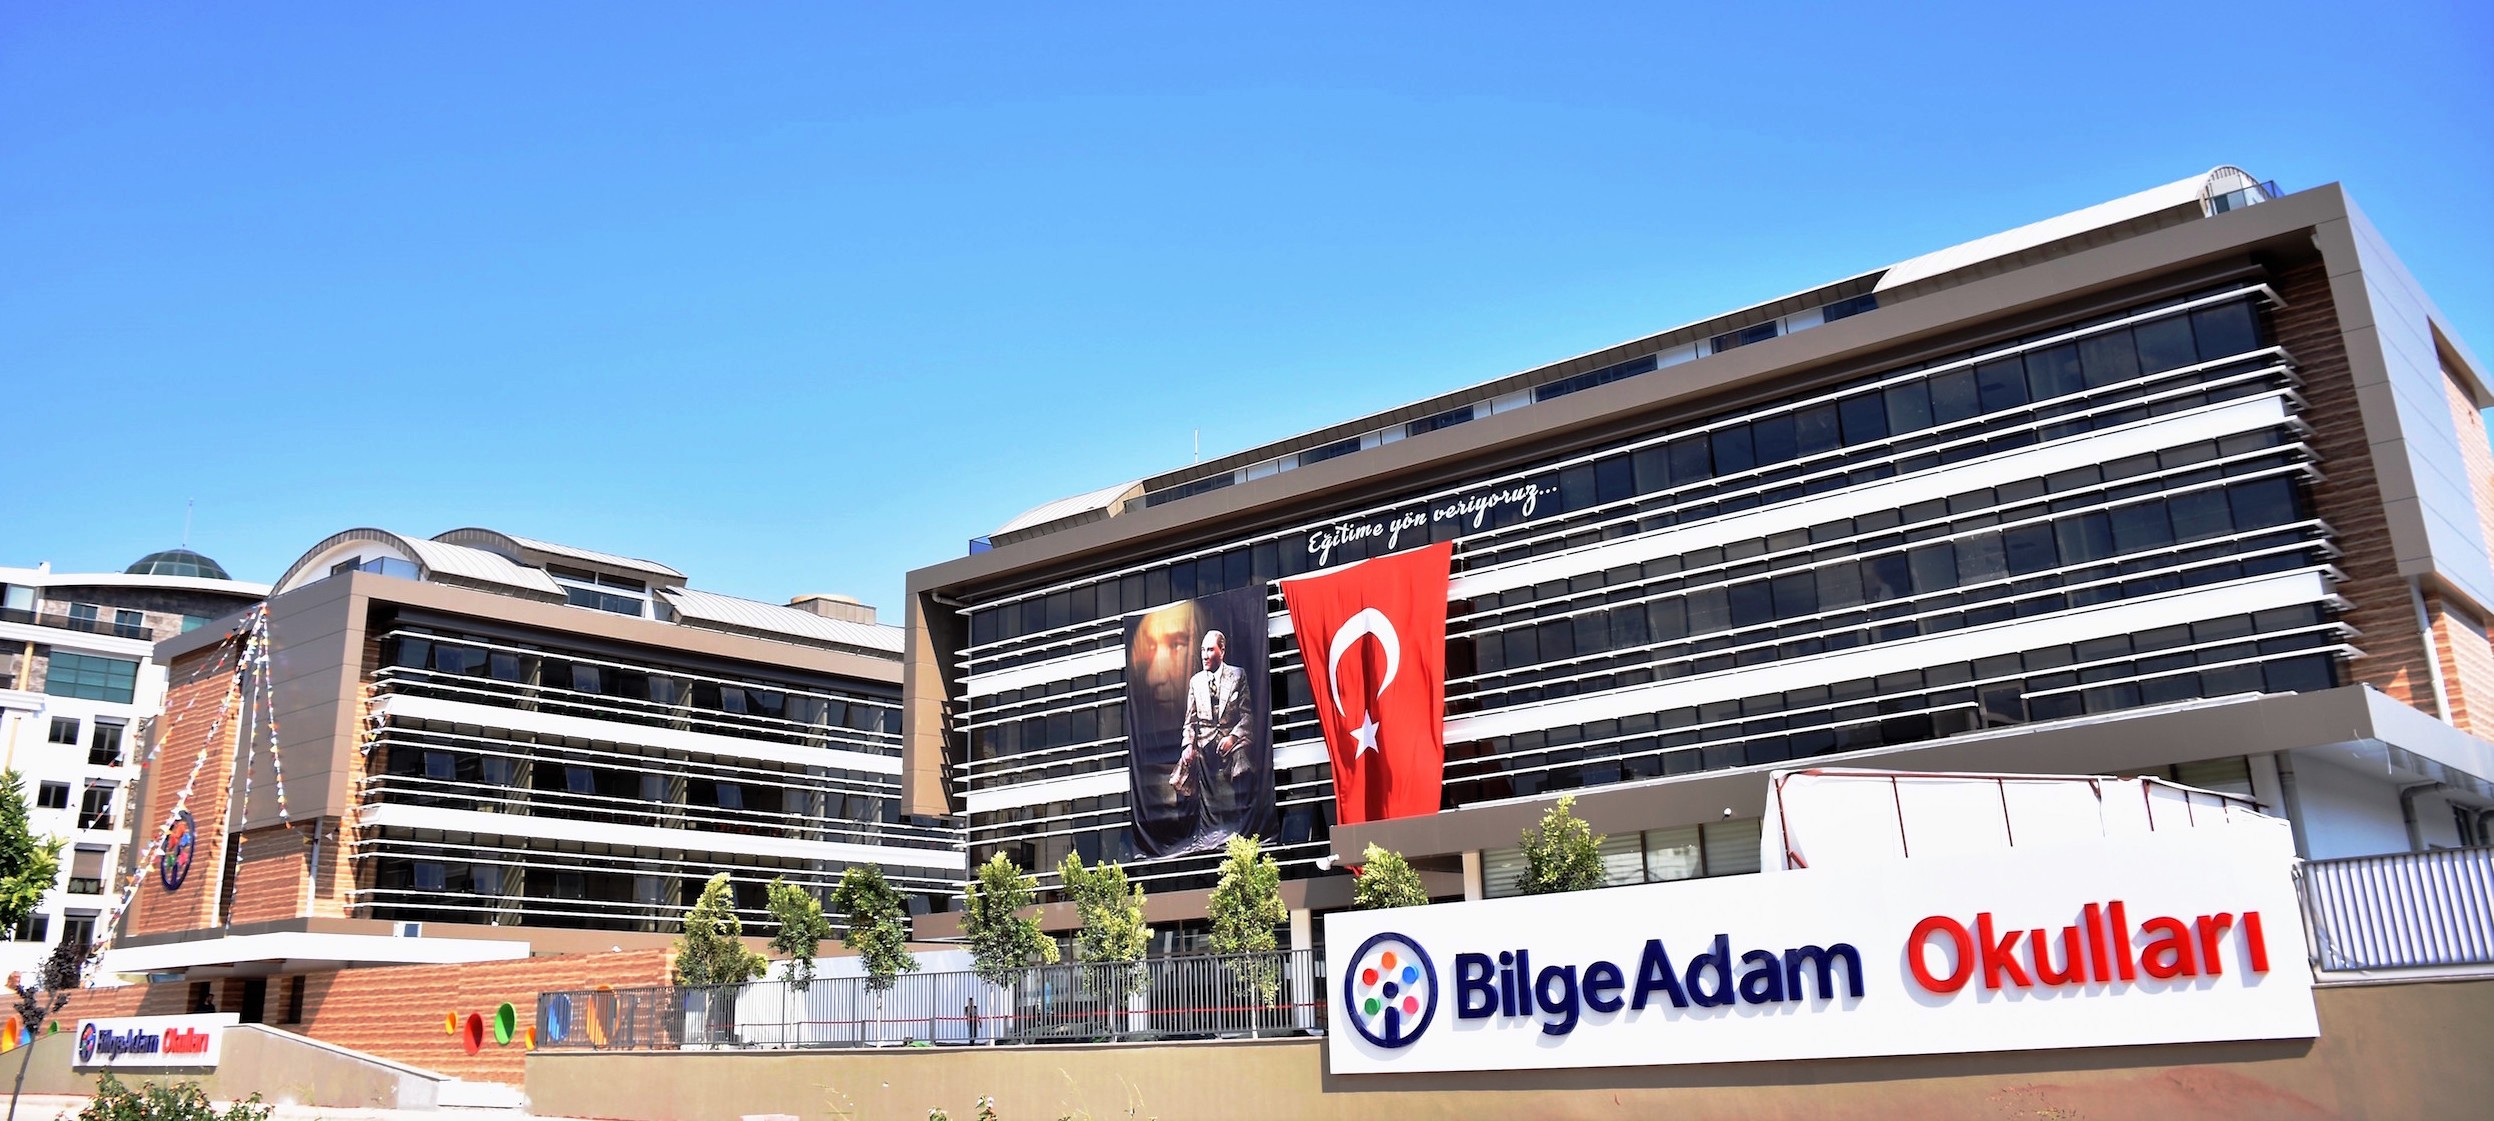 Bilge Adam Koleji Antalya Kampüsü